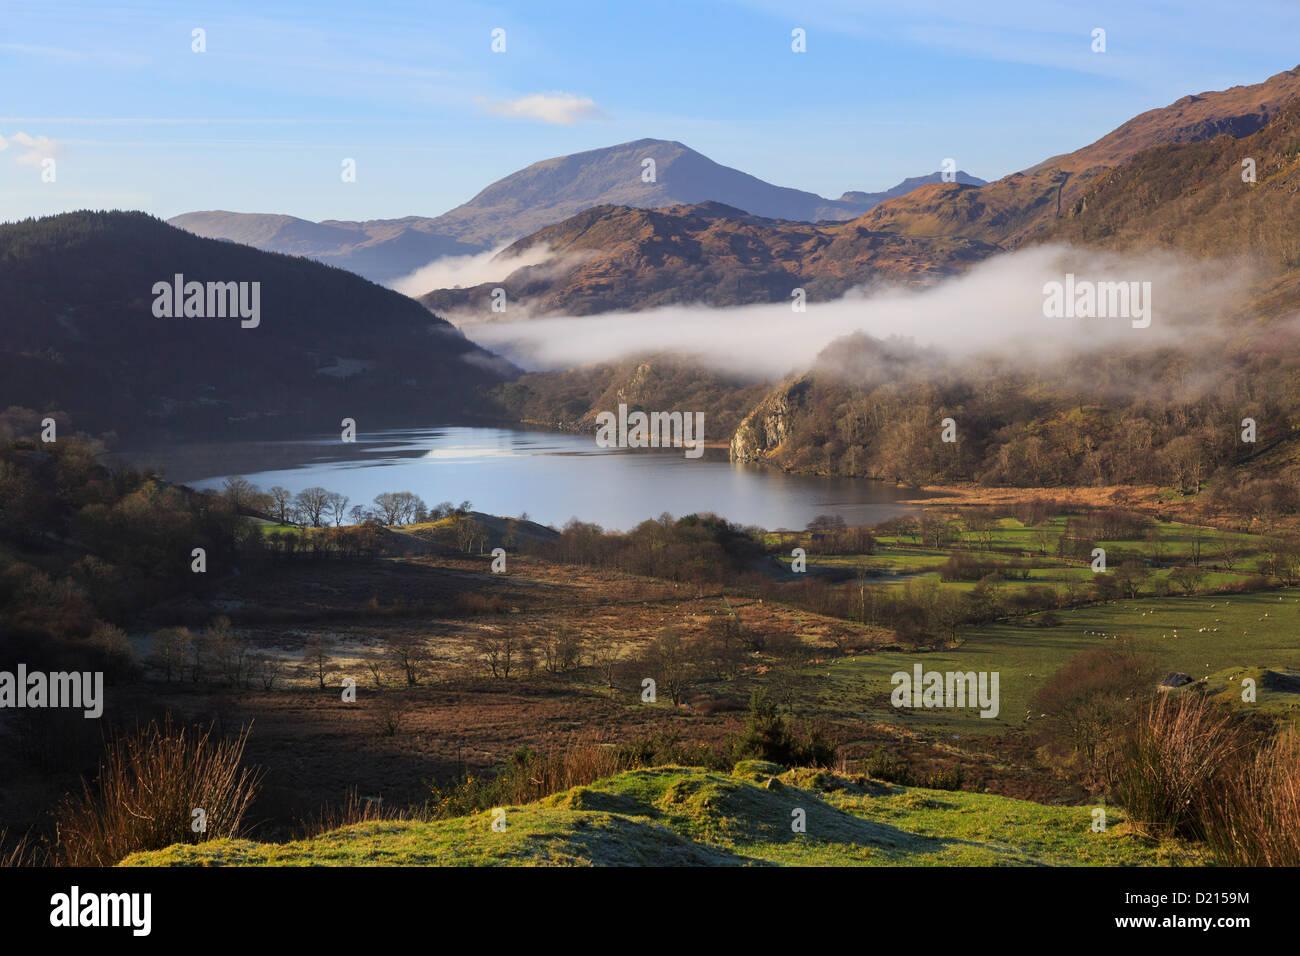 Vue panoramique le long de la vallée de Nant Gwynant Llyn Gwynant lake avec brouillard dans les montagnes du Photo Stock